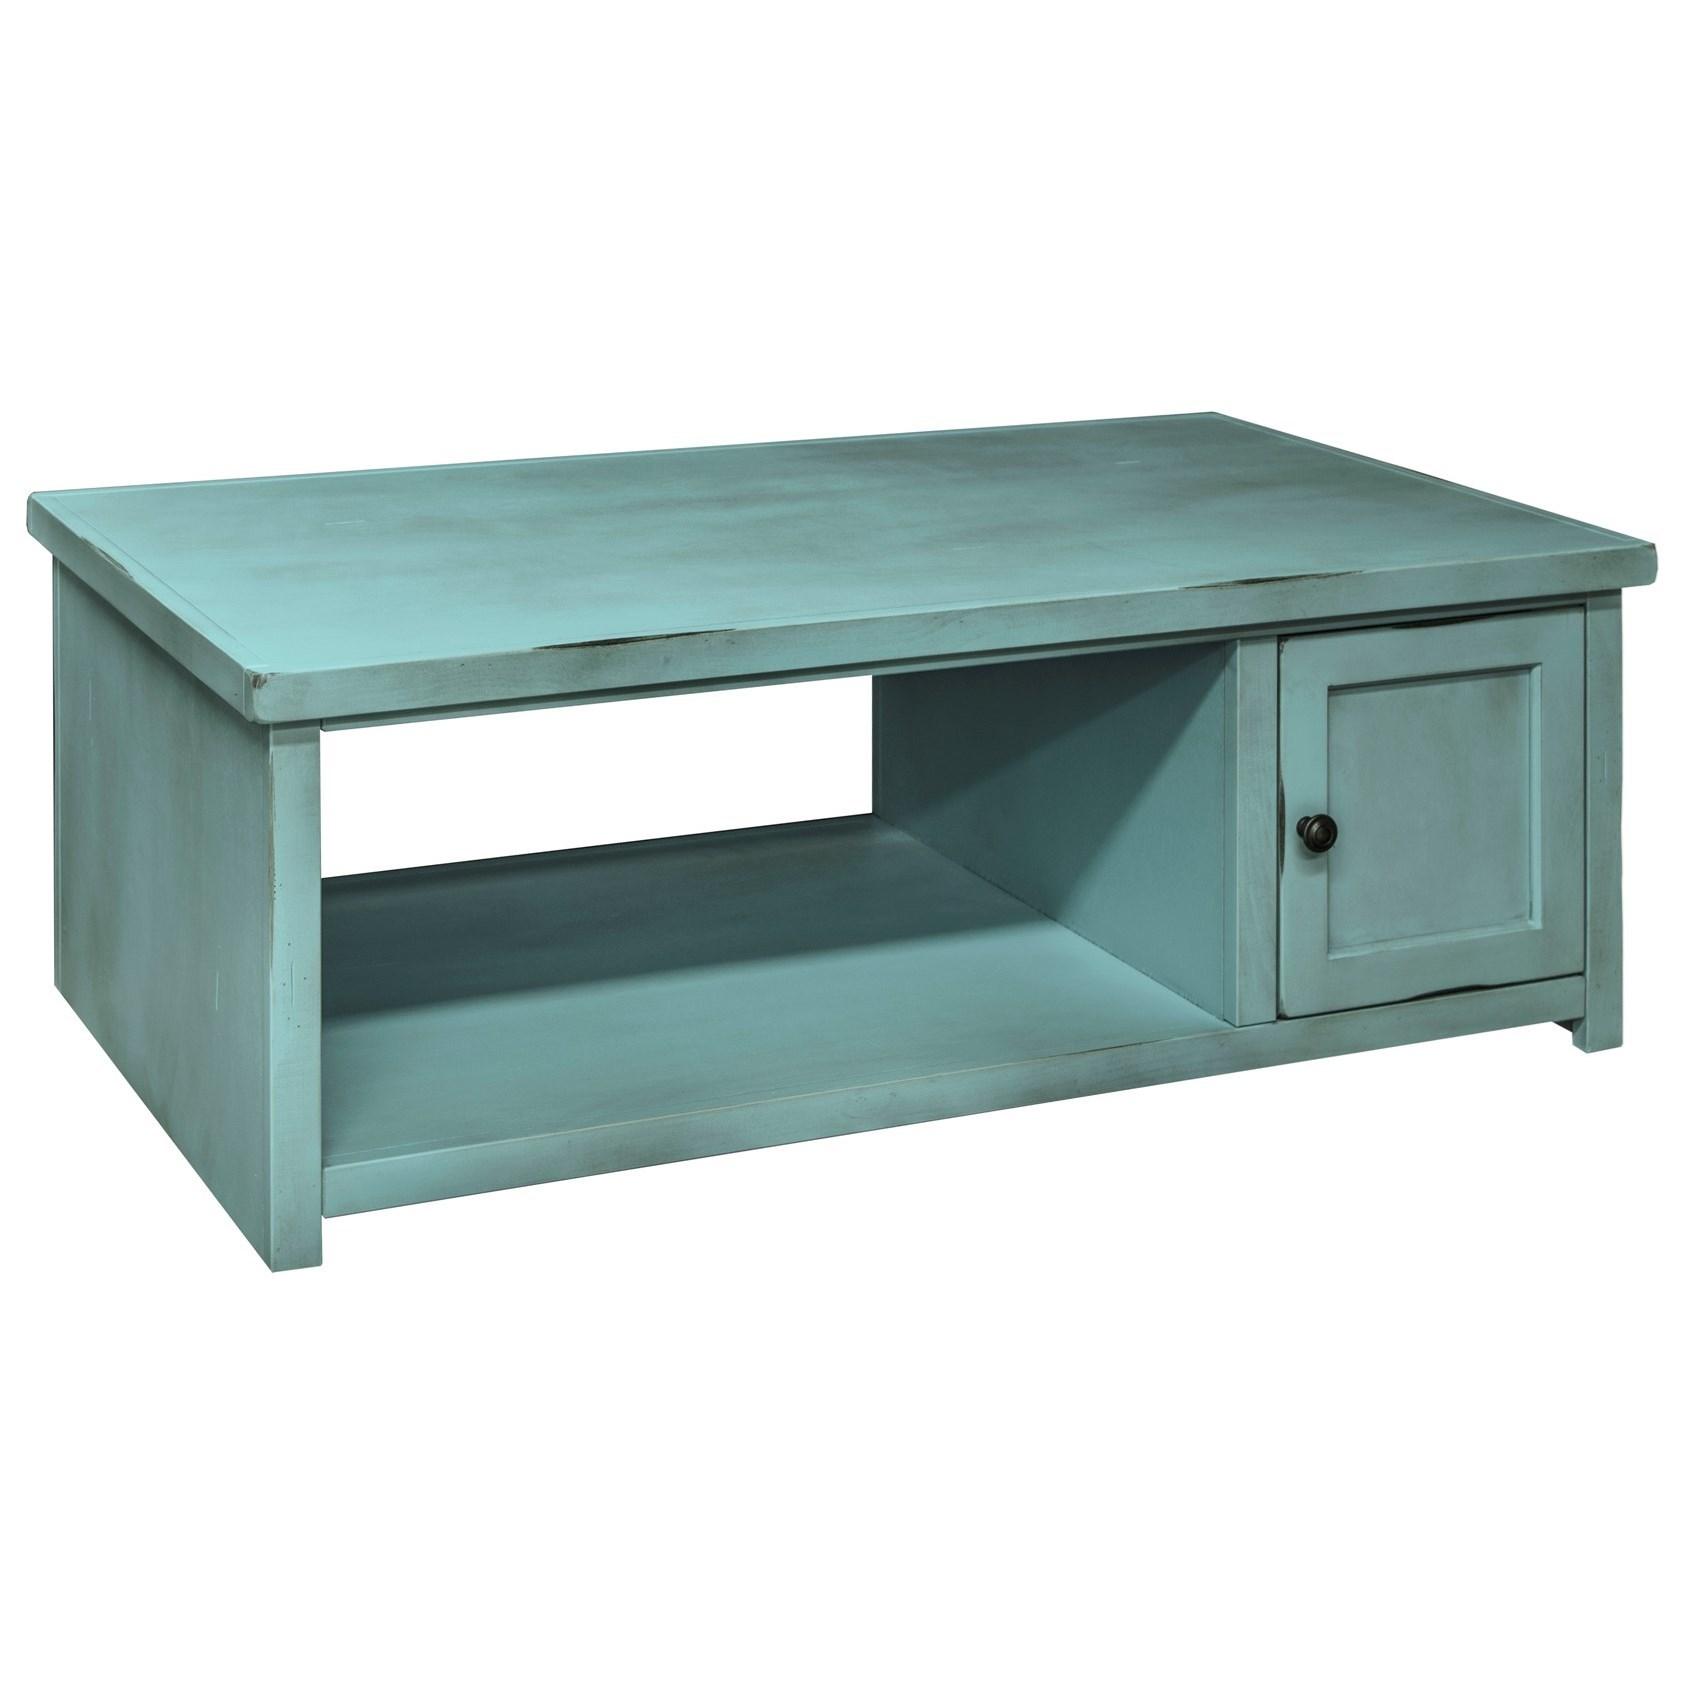 Legends Furniture Calistoga Collection Calistoga Coffee Table - Item Number: CA4220-RBL